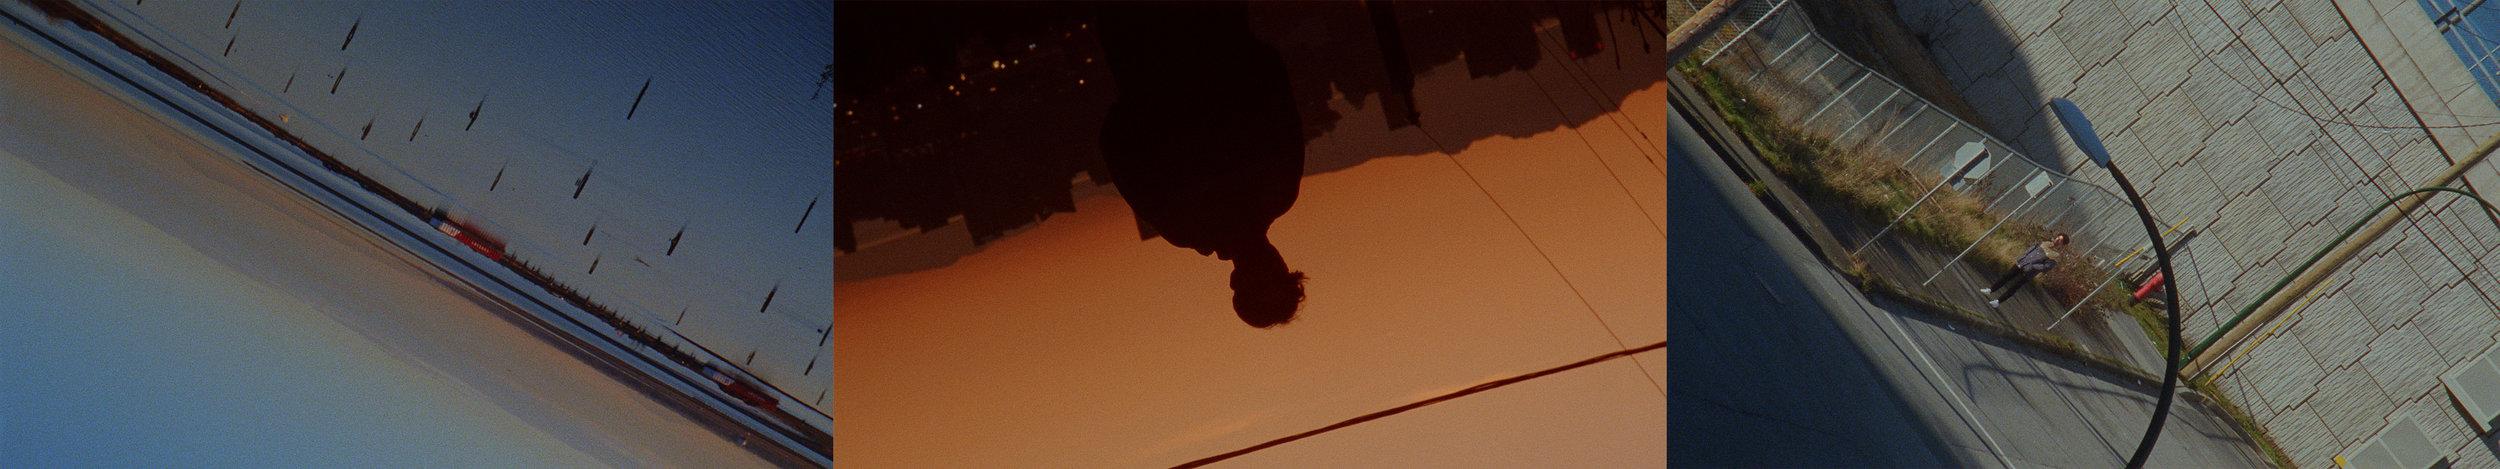 "Music Video  ""Both Your Hands"" dir. Lester Lyons-Hookham"